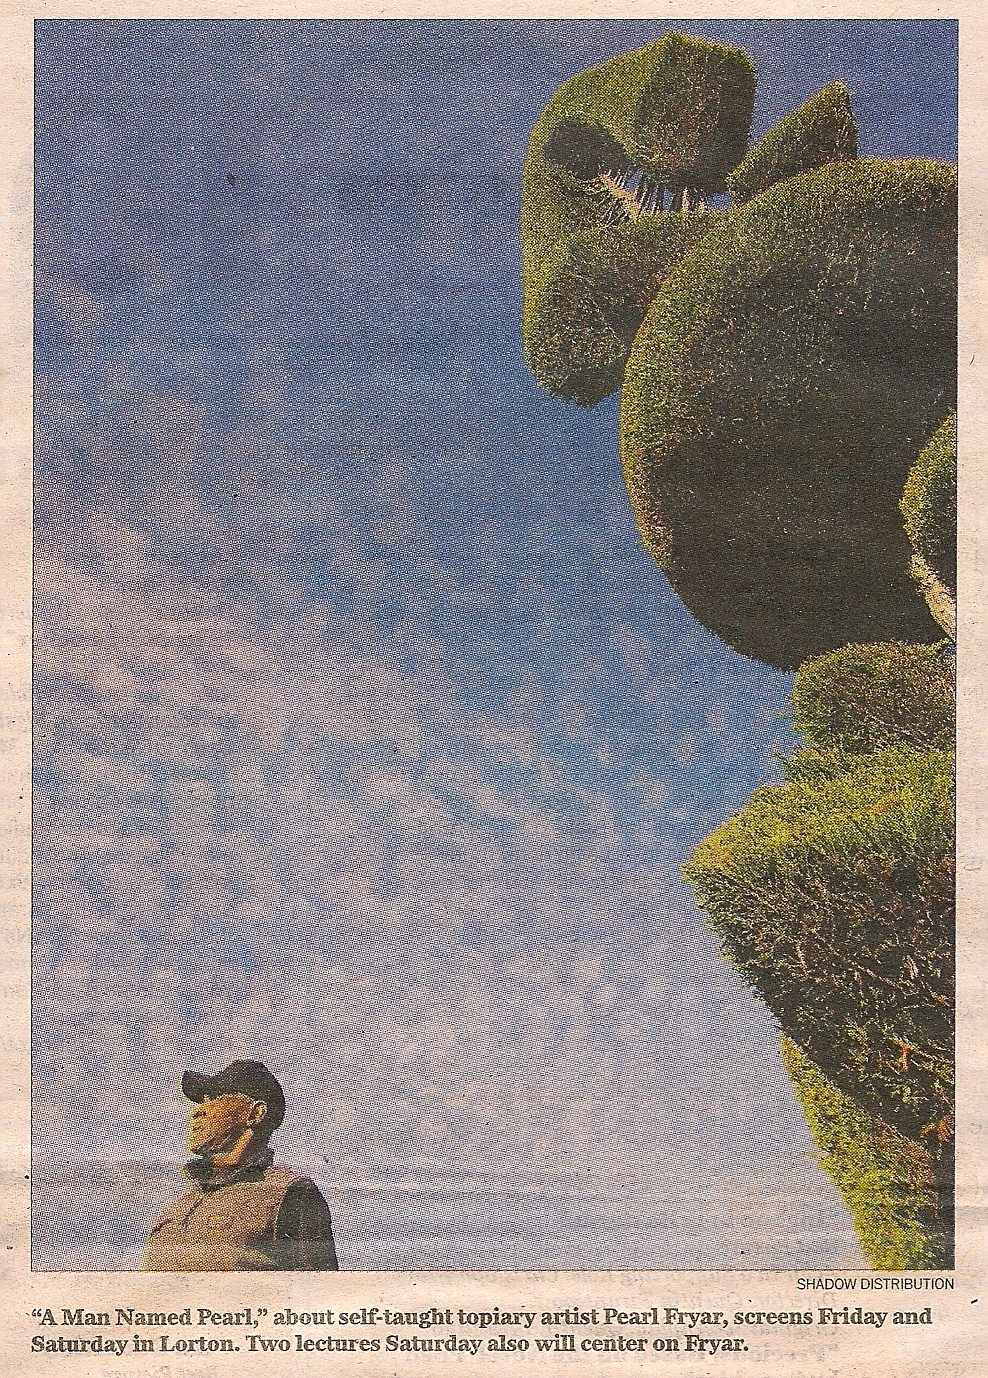 A Man Named Pearl. Photo by Shadow Distribution via Washington Post